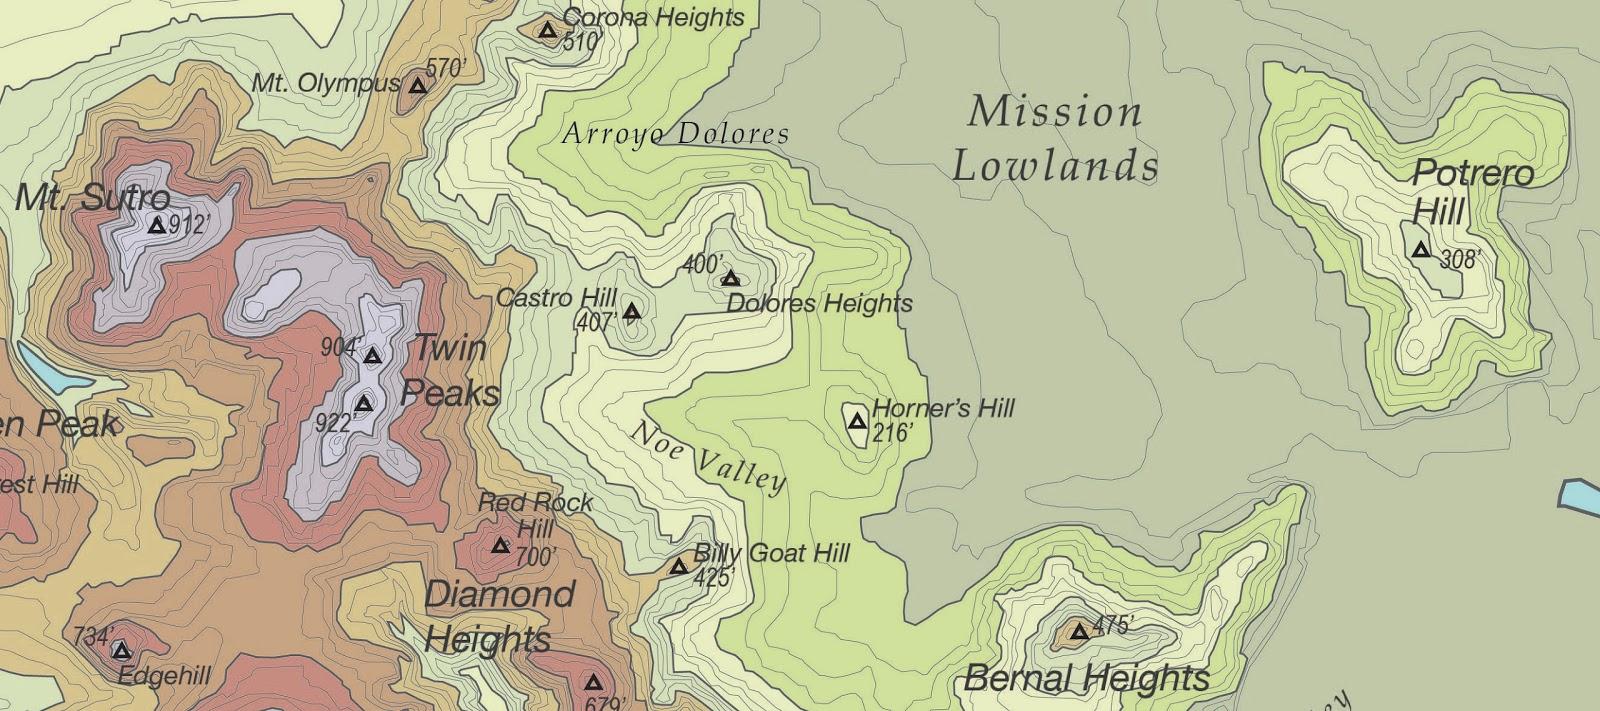 San Francisco Hills Map v2